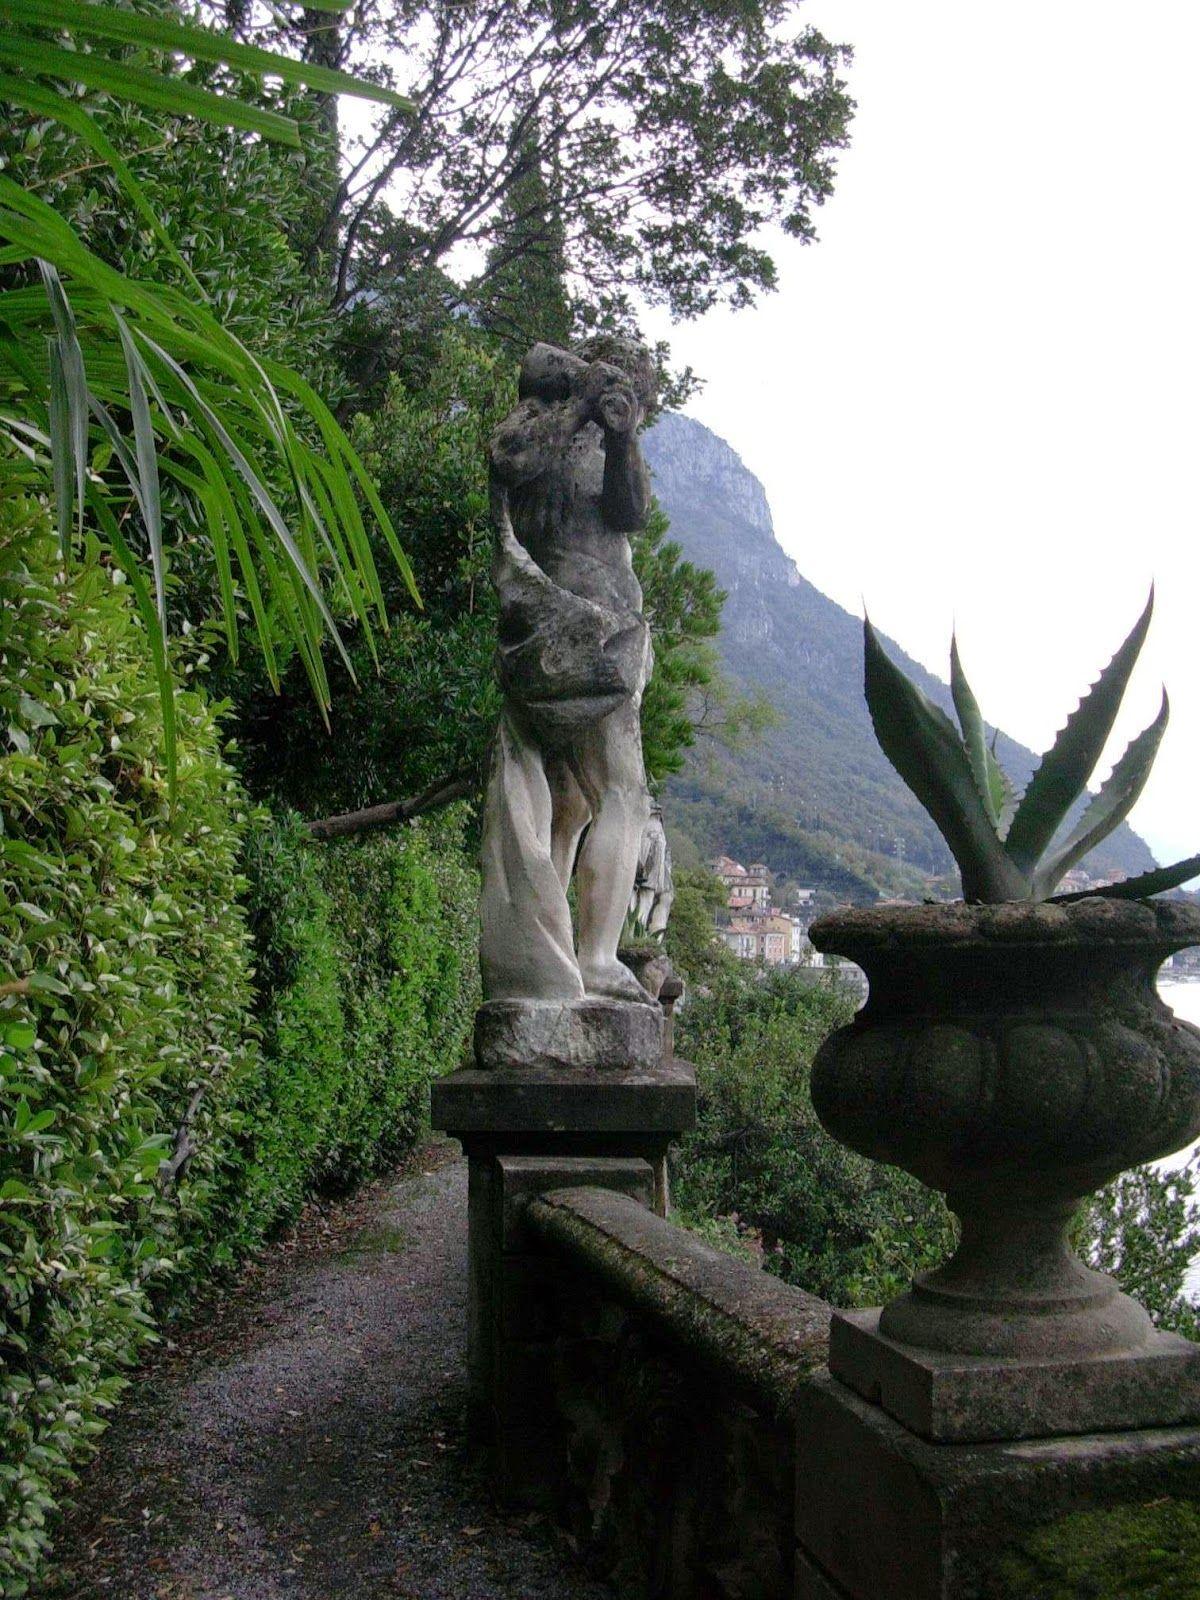 Il giardino di villa monastero a varenna lecco http for Giardino lecco